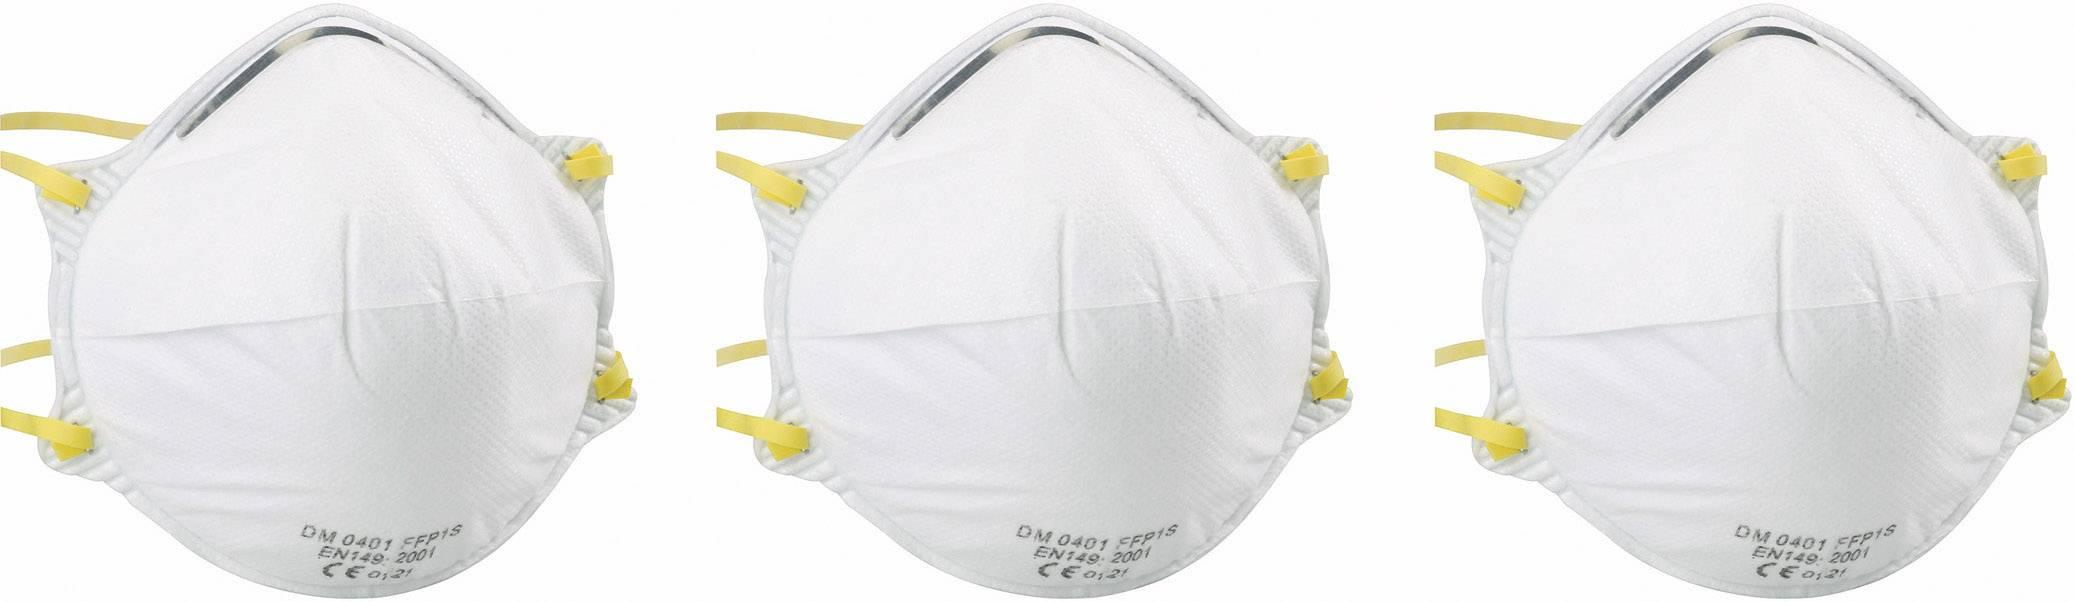 Respirátor proti jemnému prachu EKASTU Sekur FFP1, 3 ks